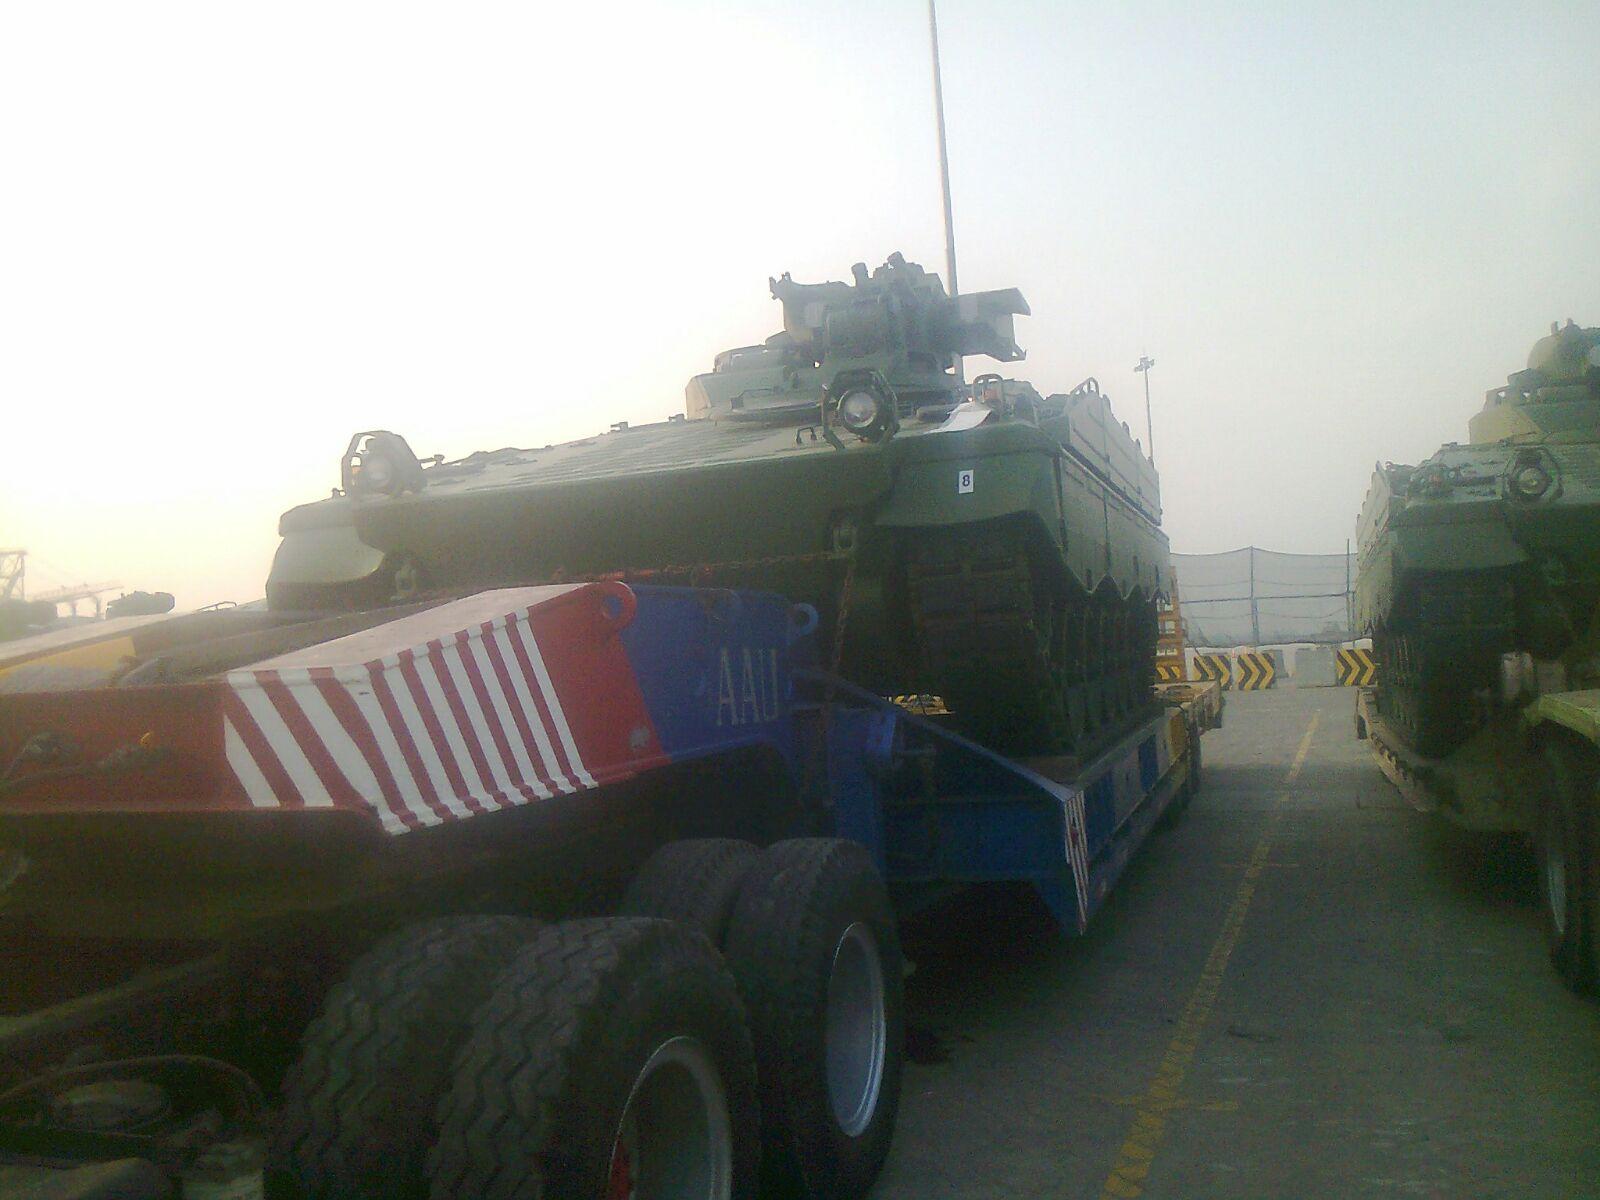 TNI PROJECT